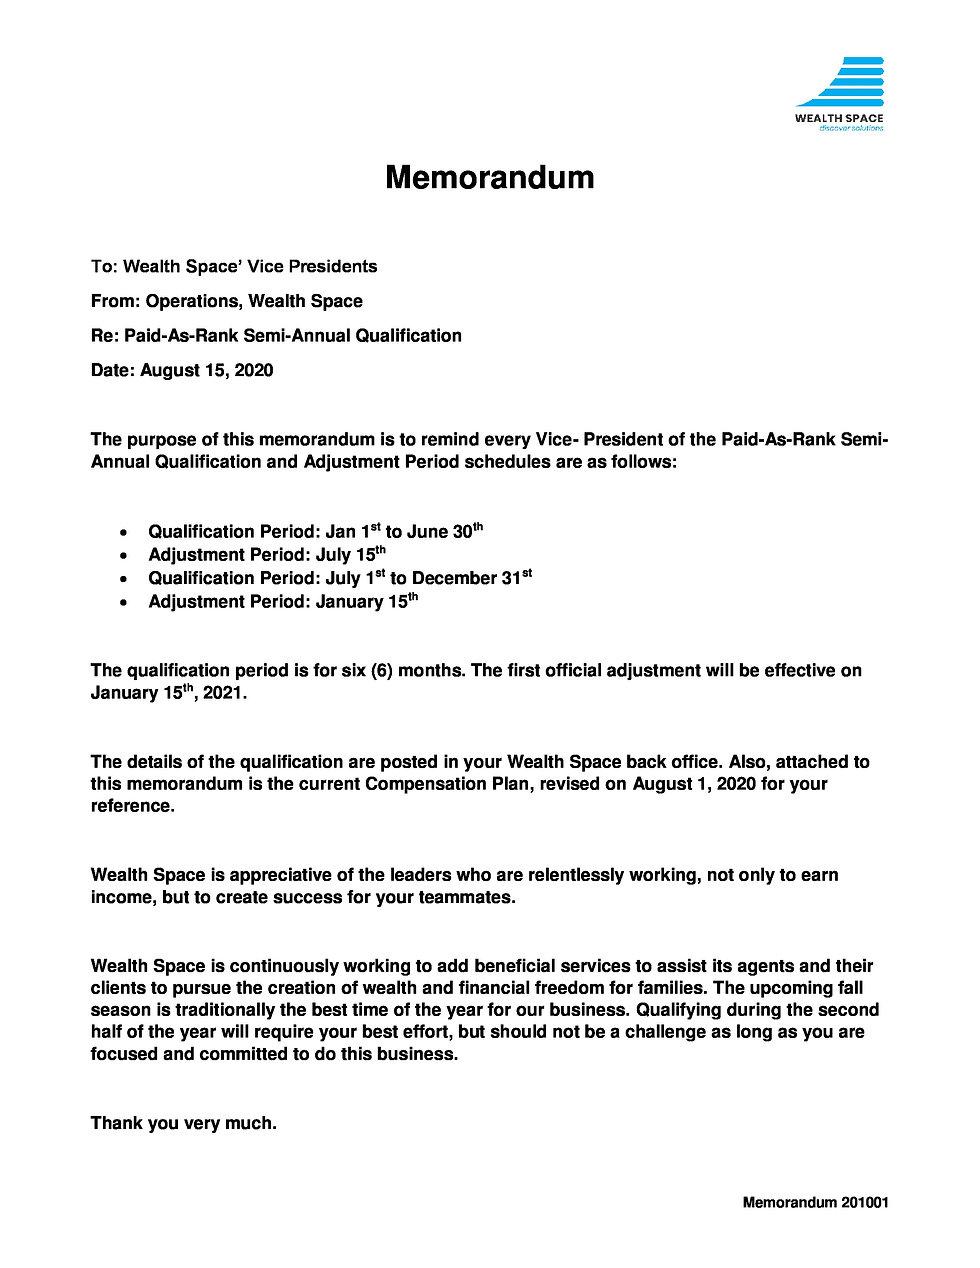 WS-Memorandum201001-page-0.jpg